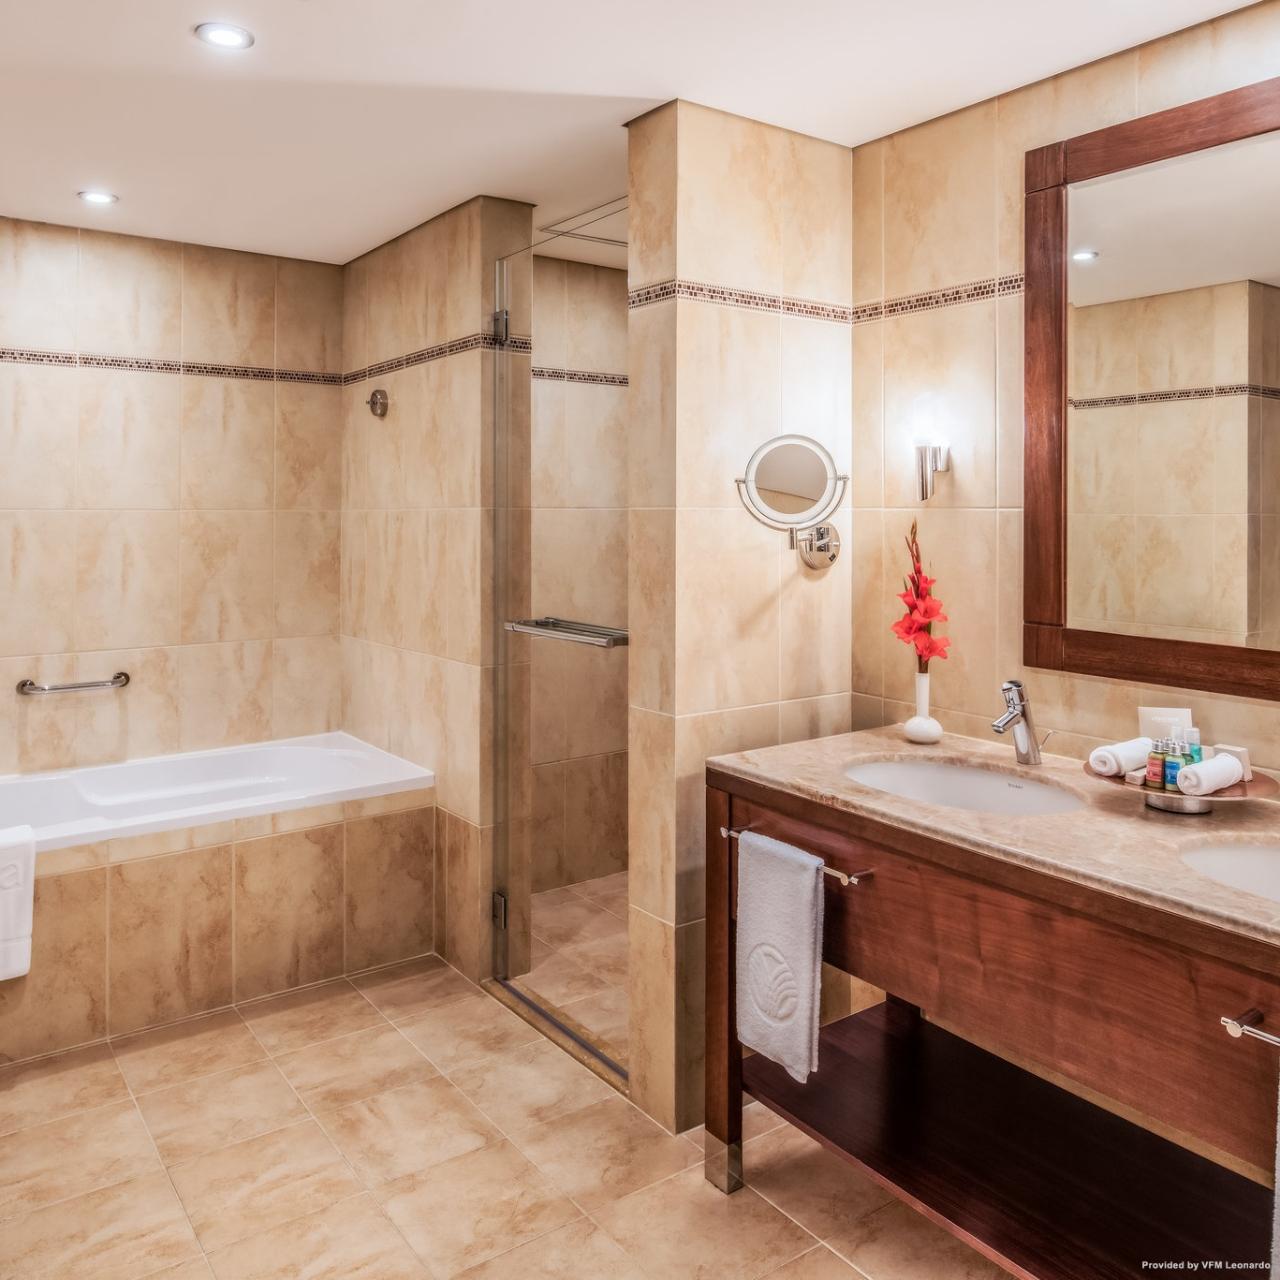 Hotel Khalidiya Palace Rayhaan By Rotana Verenigde Arabische Emiraten Bij Hrs Met Gratis Diensten